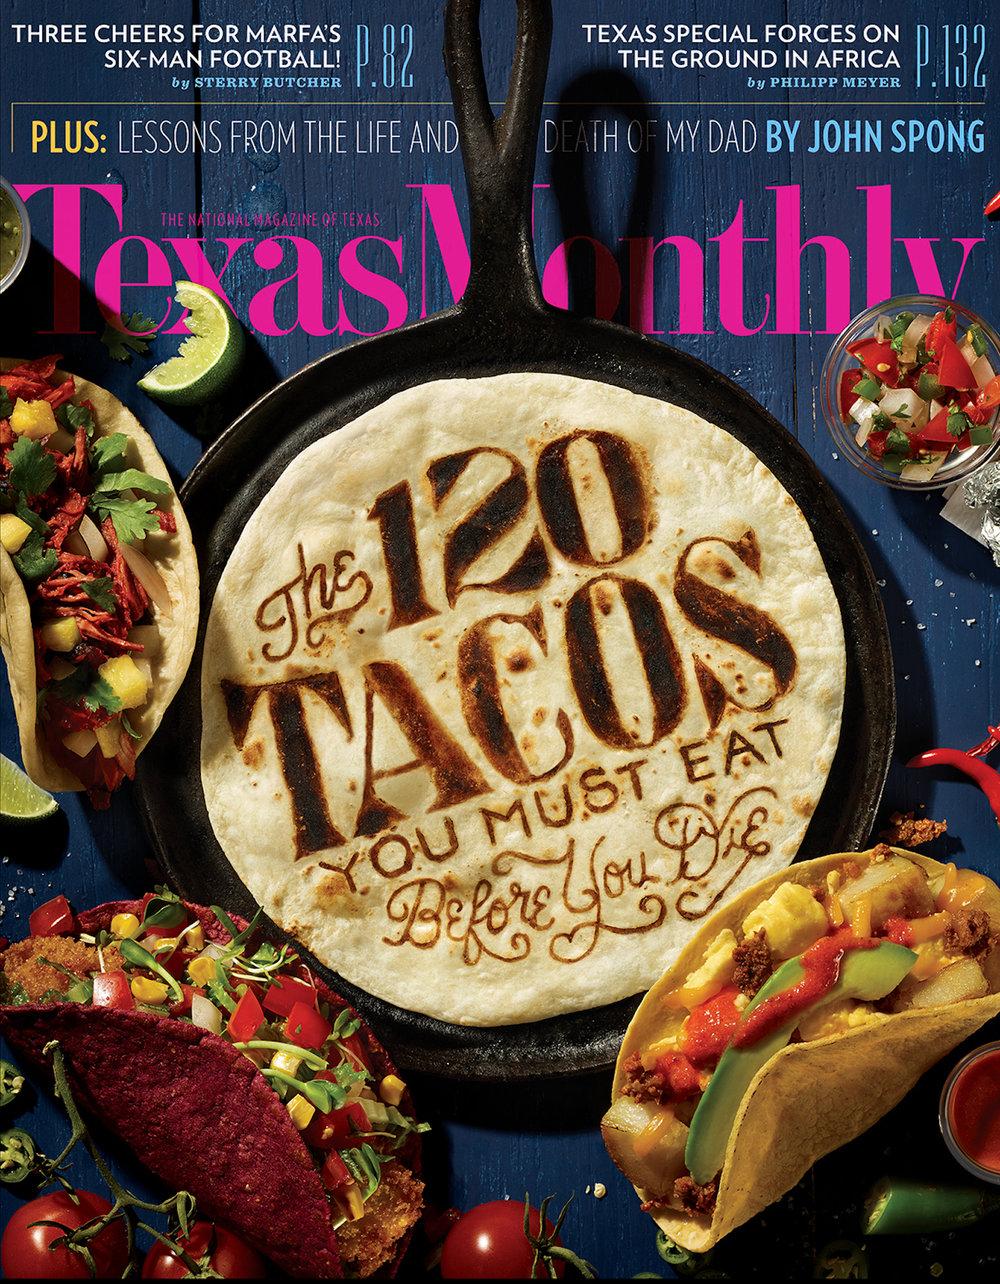 TexMoTaco_COVER copy.jpg